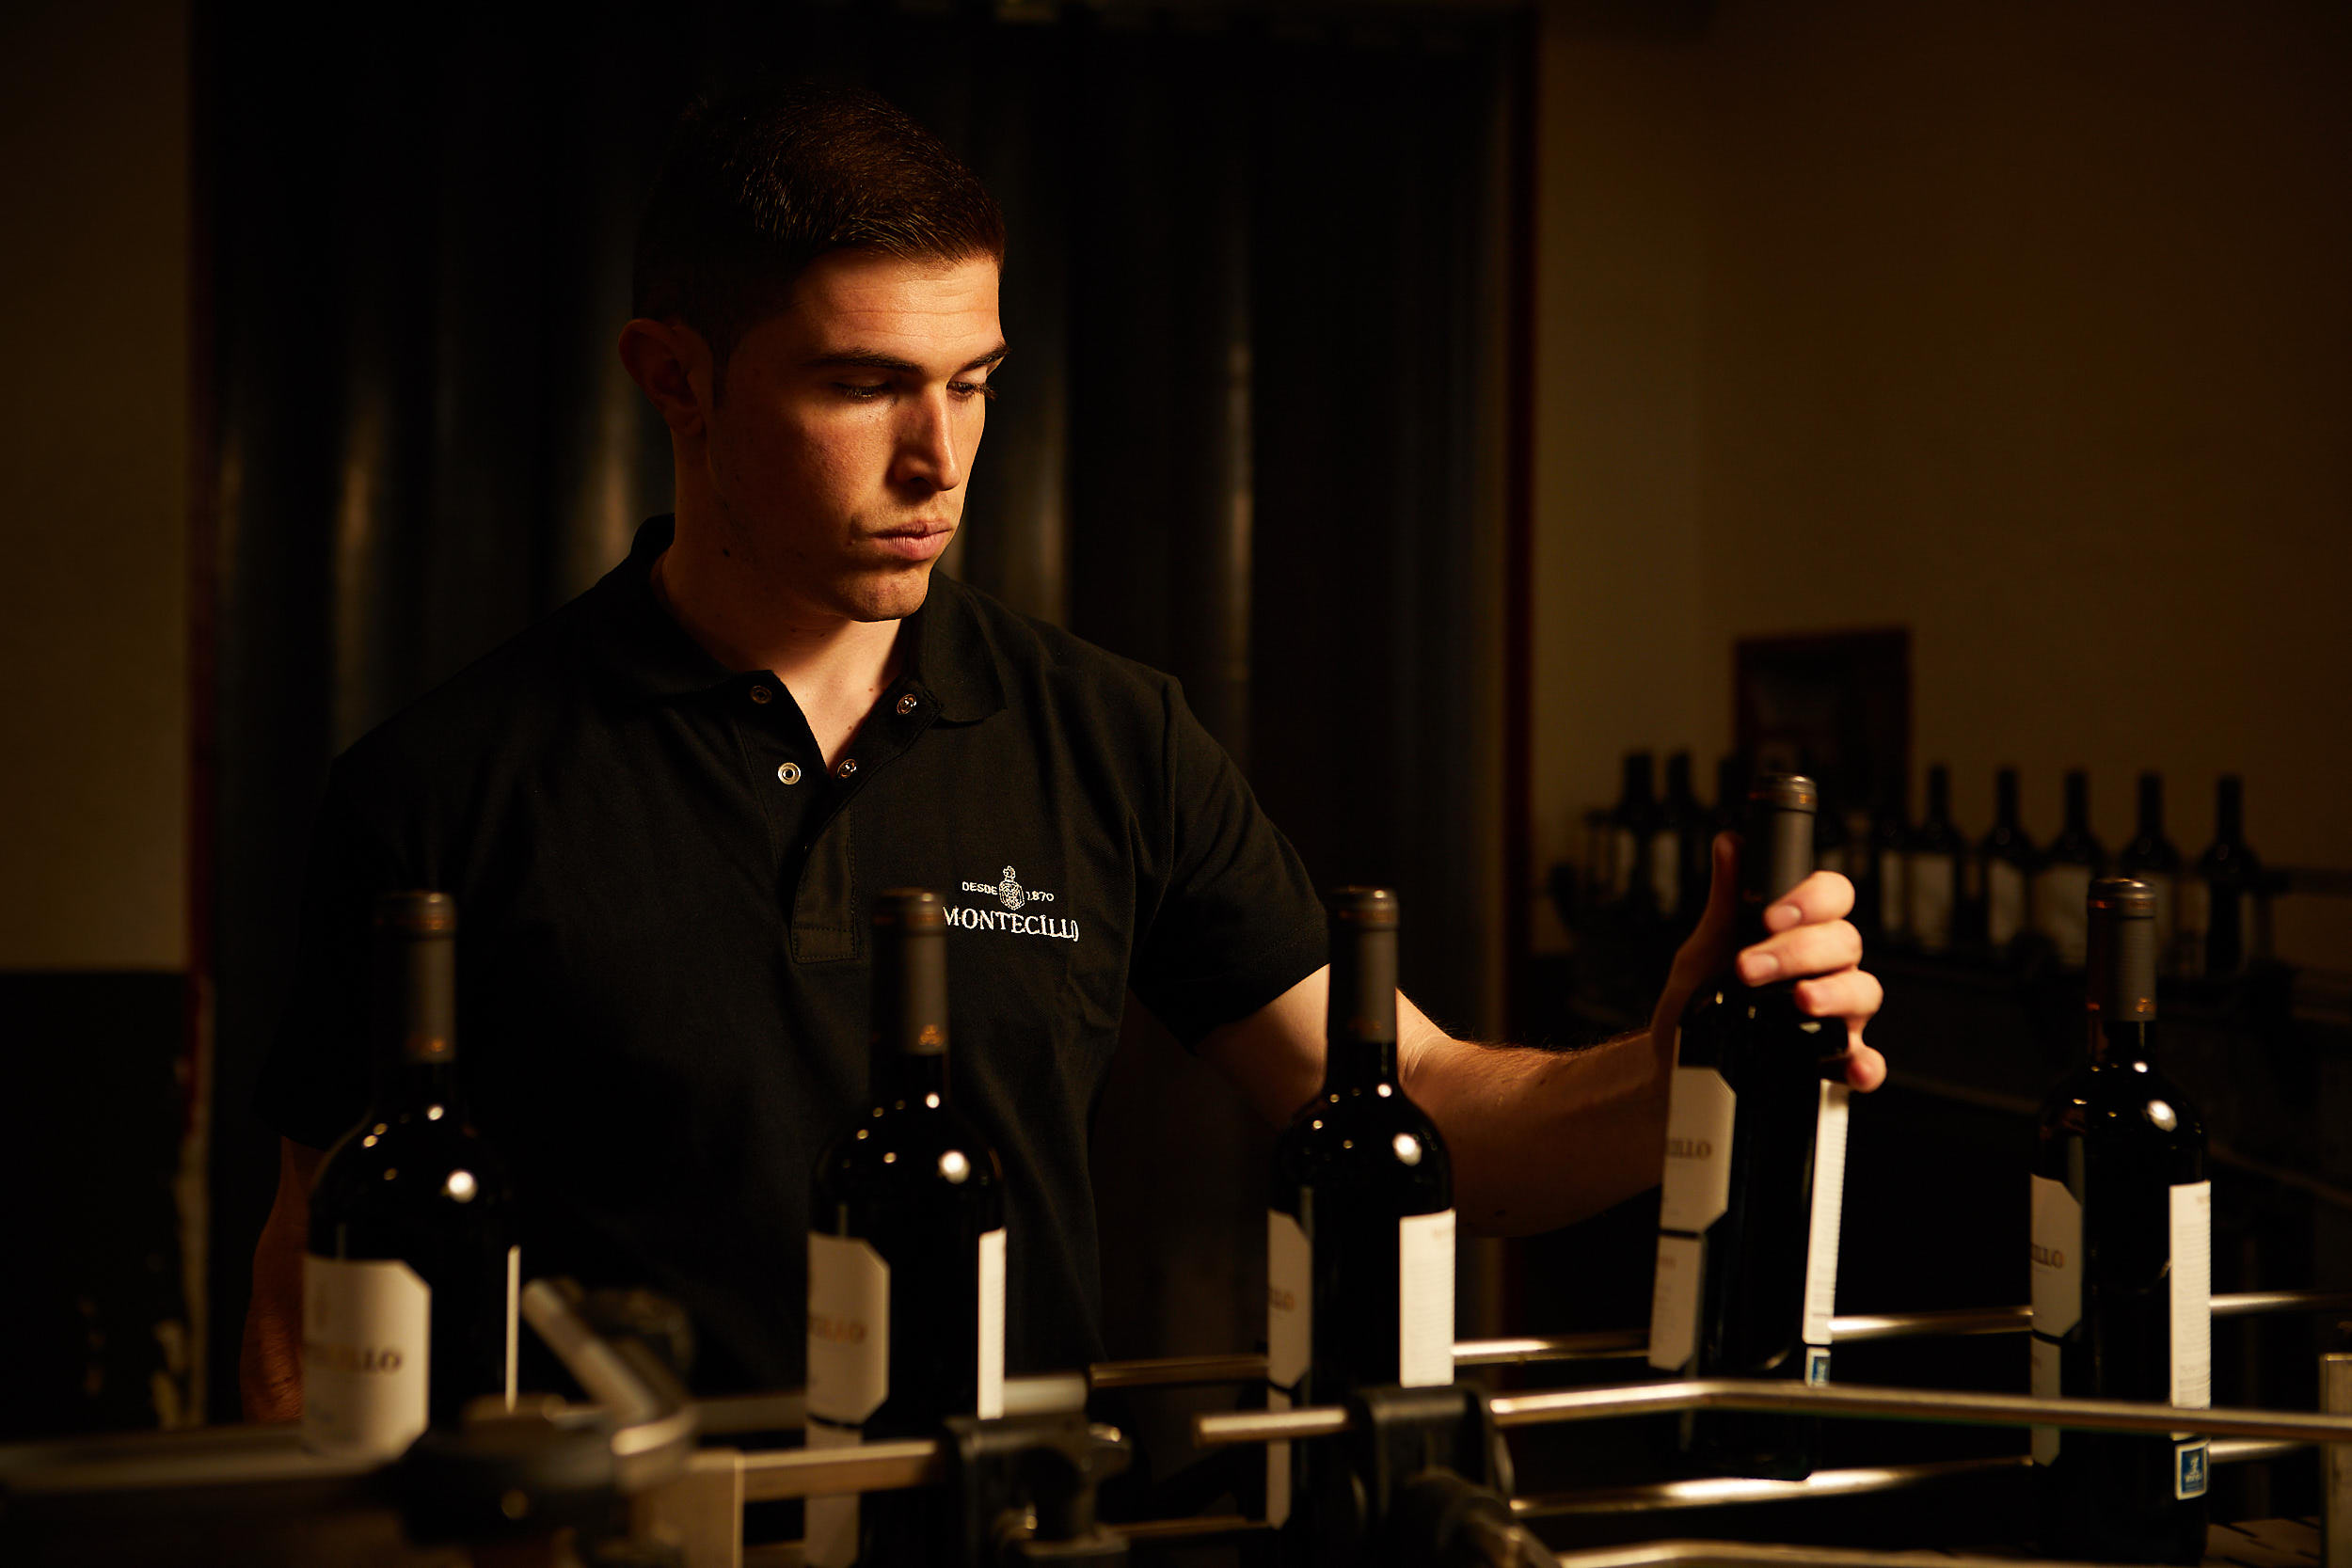 1805Commercial-professional-wine-photography-la-rioja-spain-James-Sturcke_0020.jpg